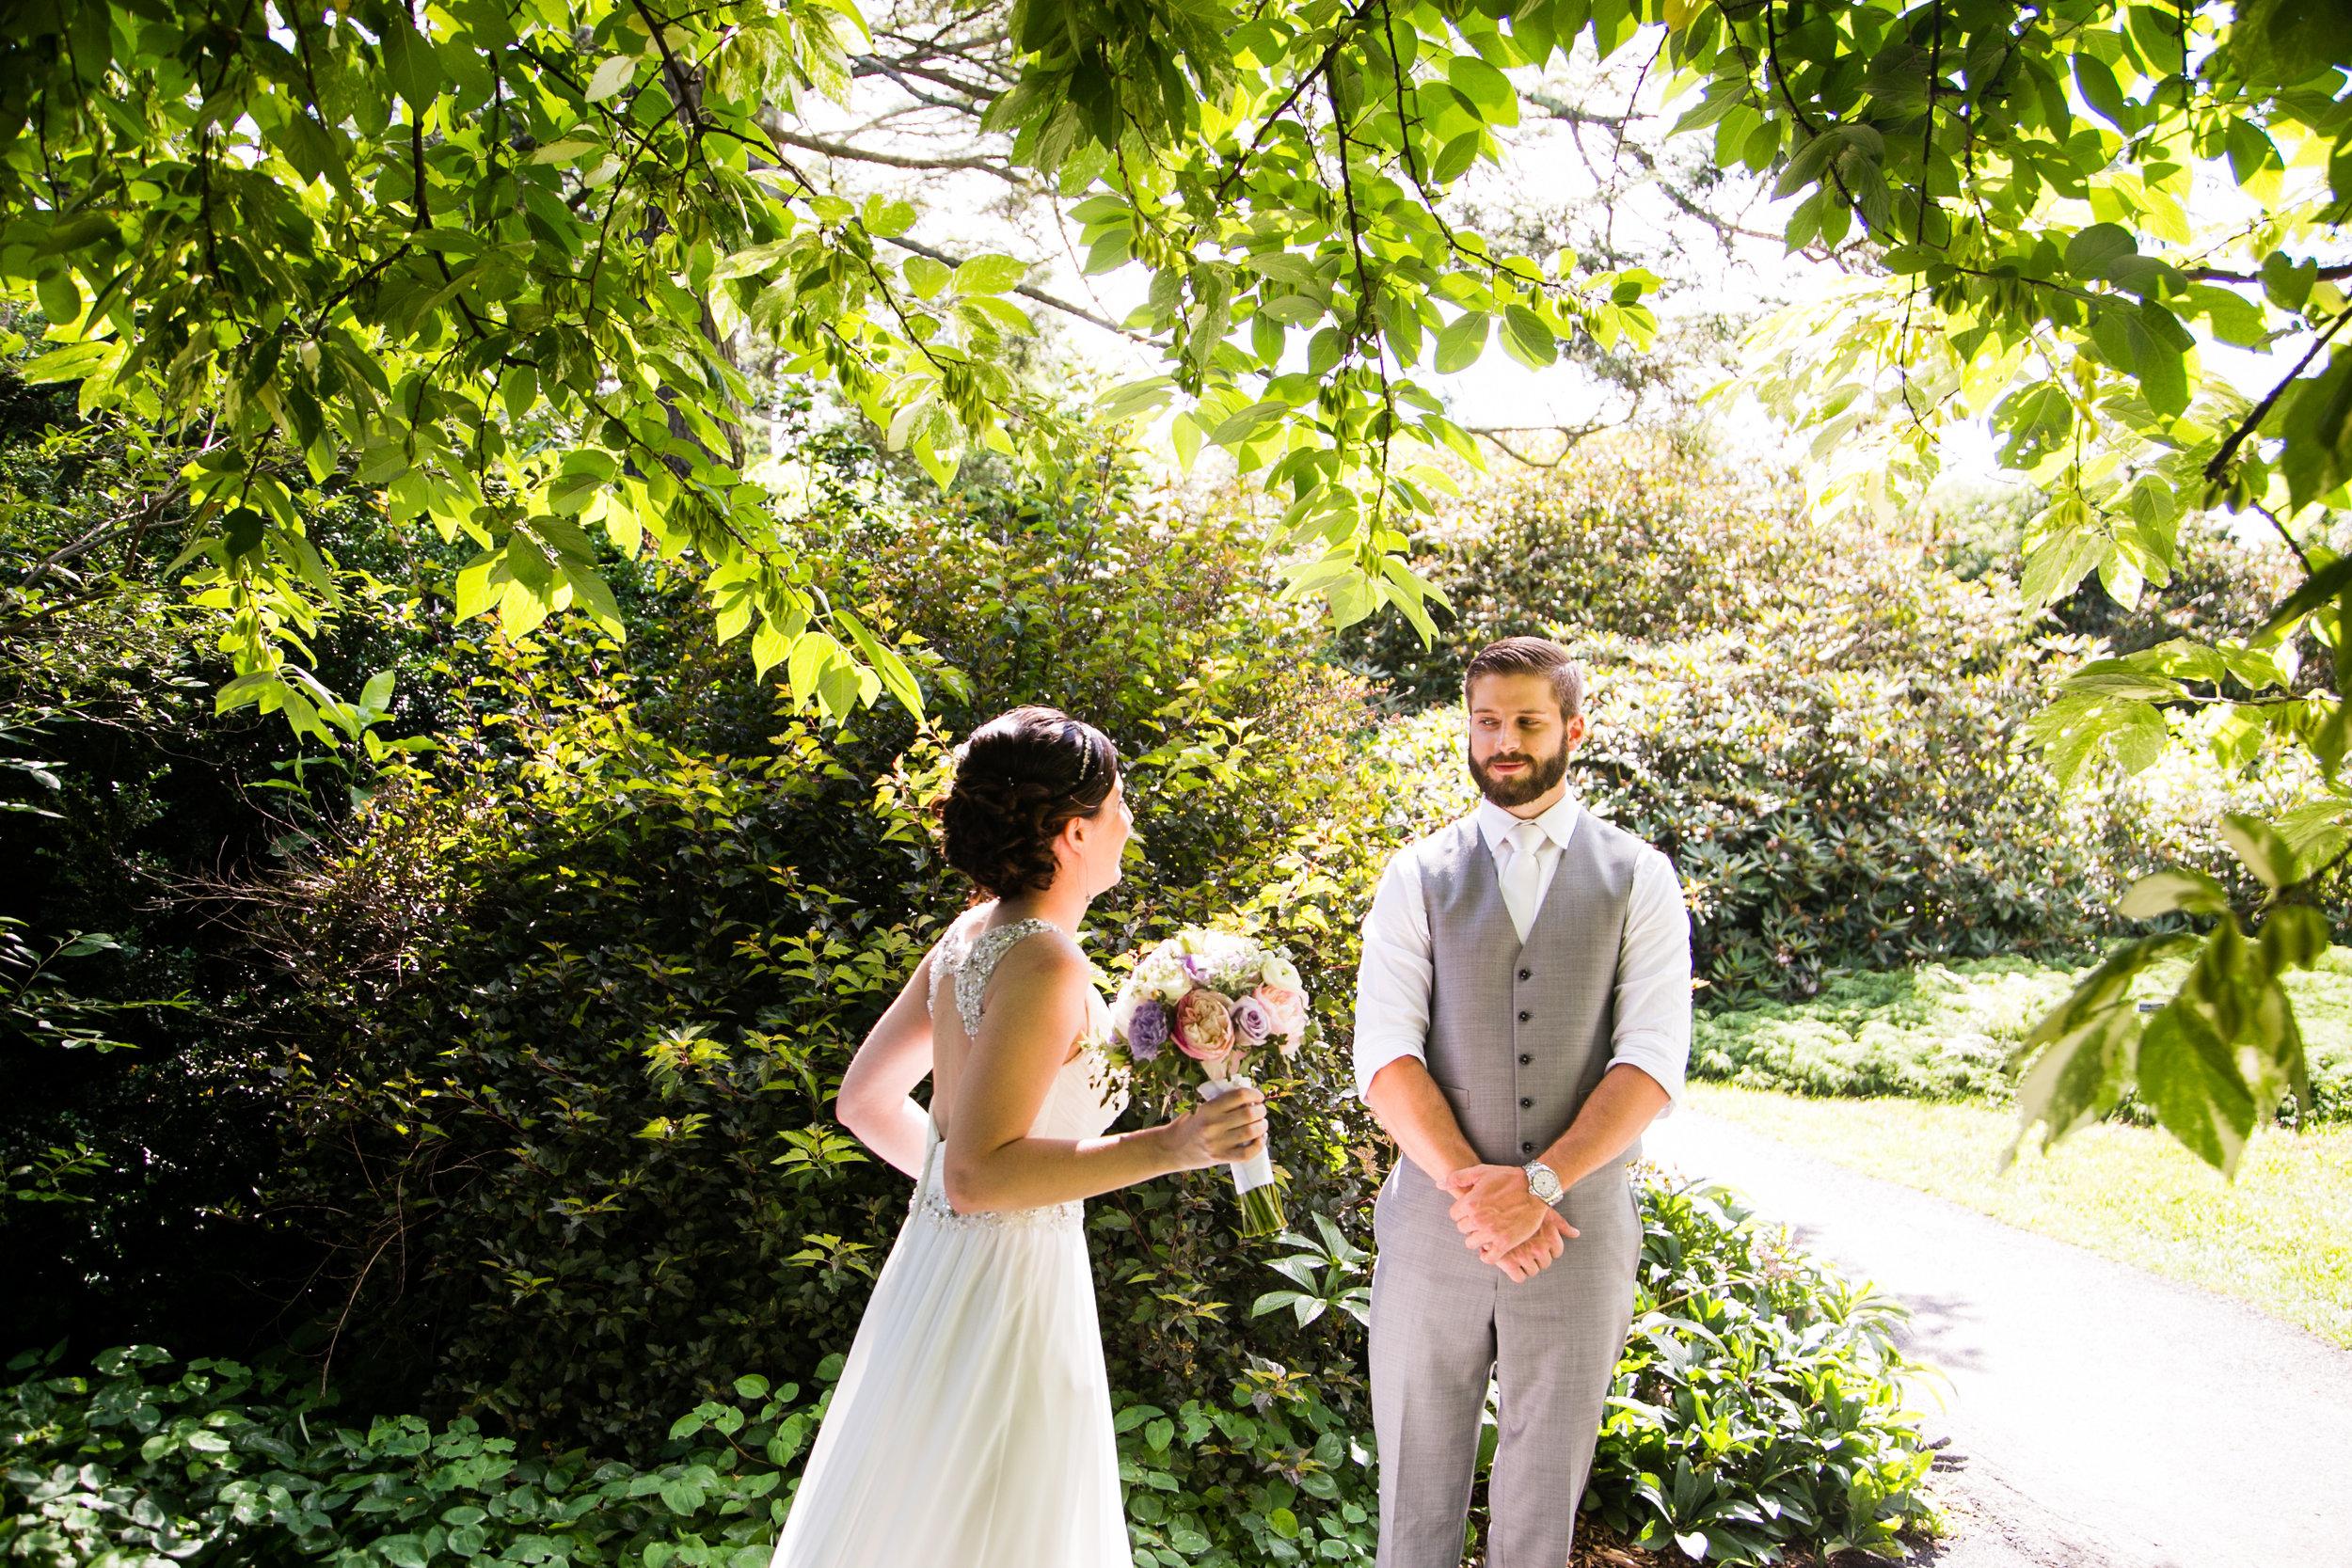 TYLER ARBORETUM WEDDING PHOTOGRAPHY LOVESTRUCK PICTURES-014.jpg